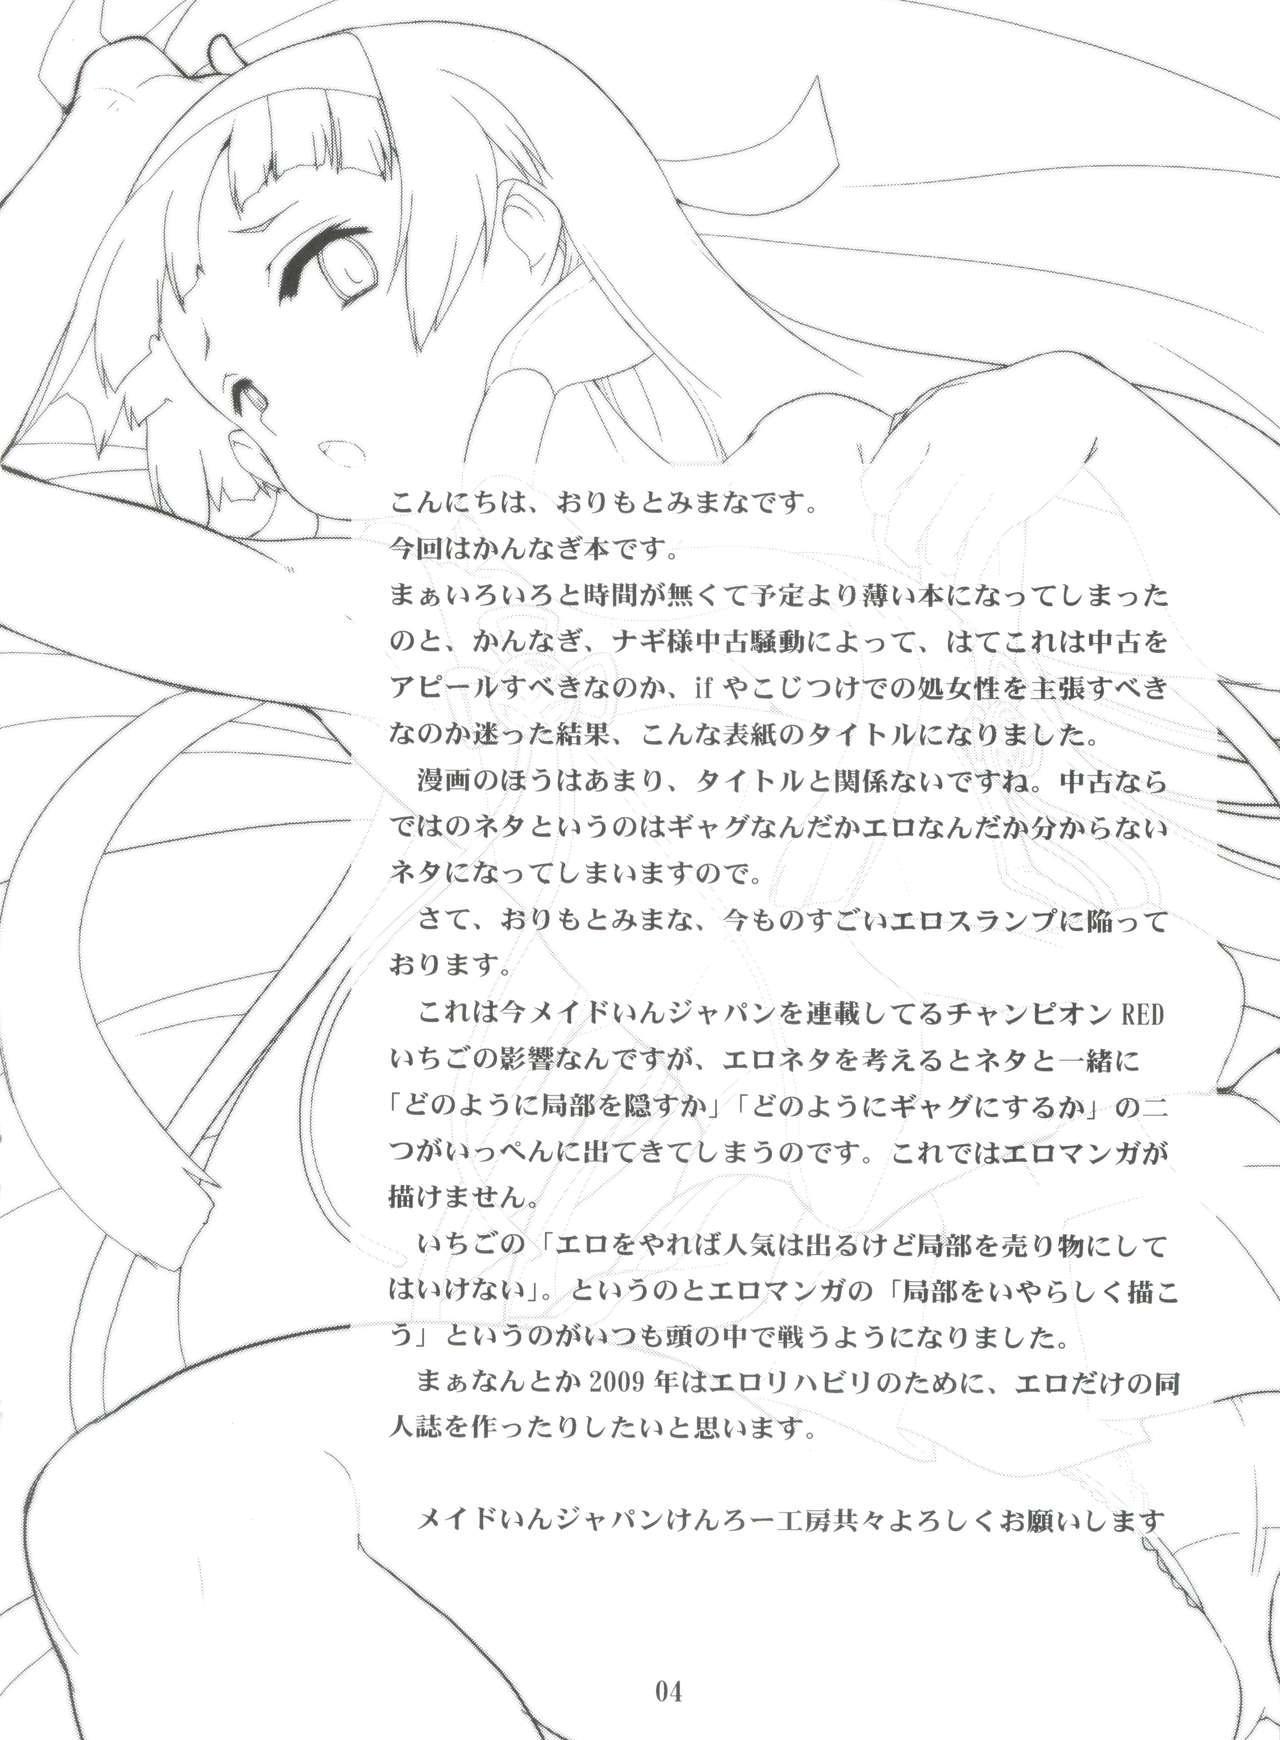 Nagi-sama Recycle 2